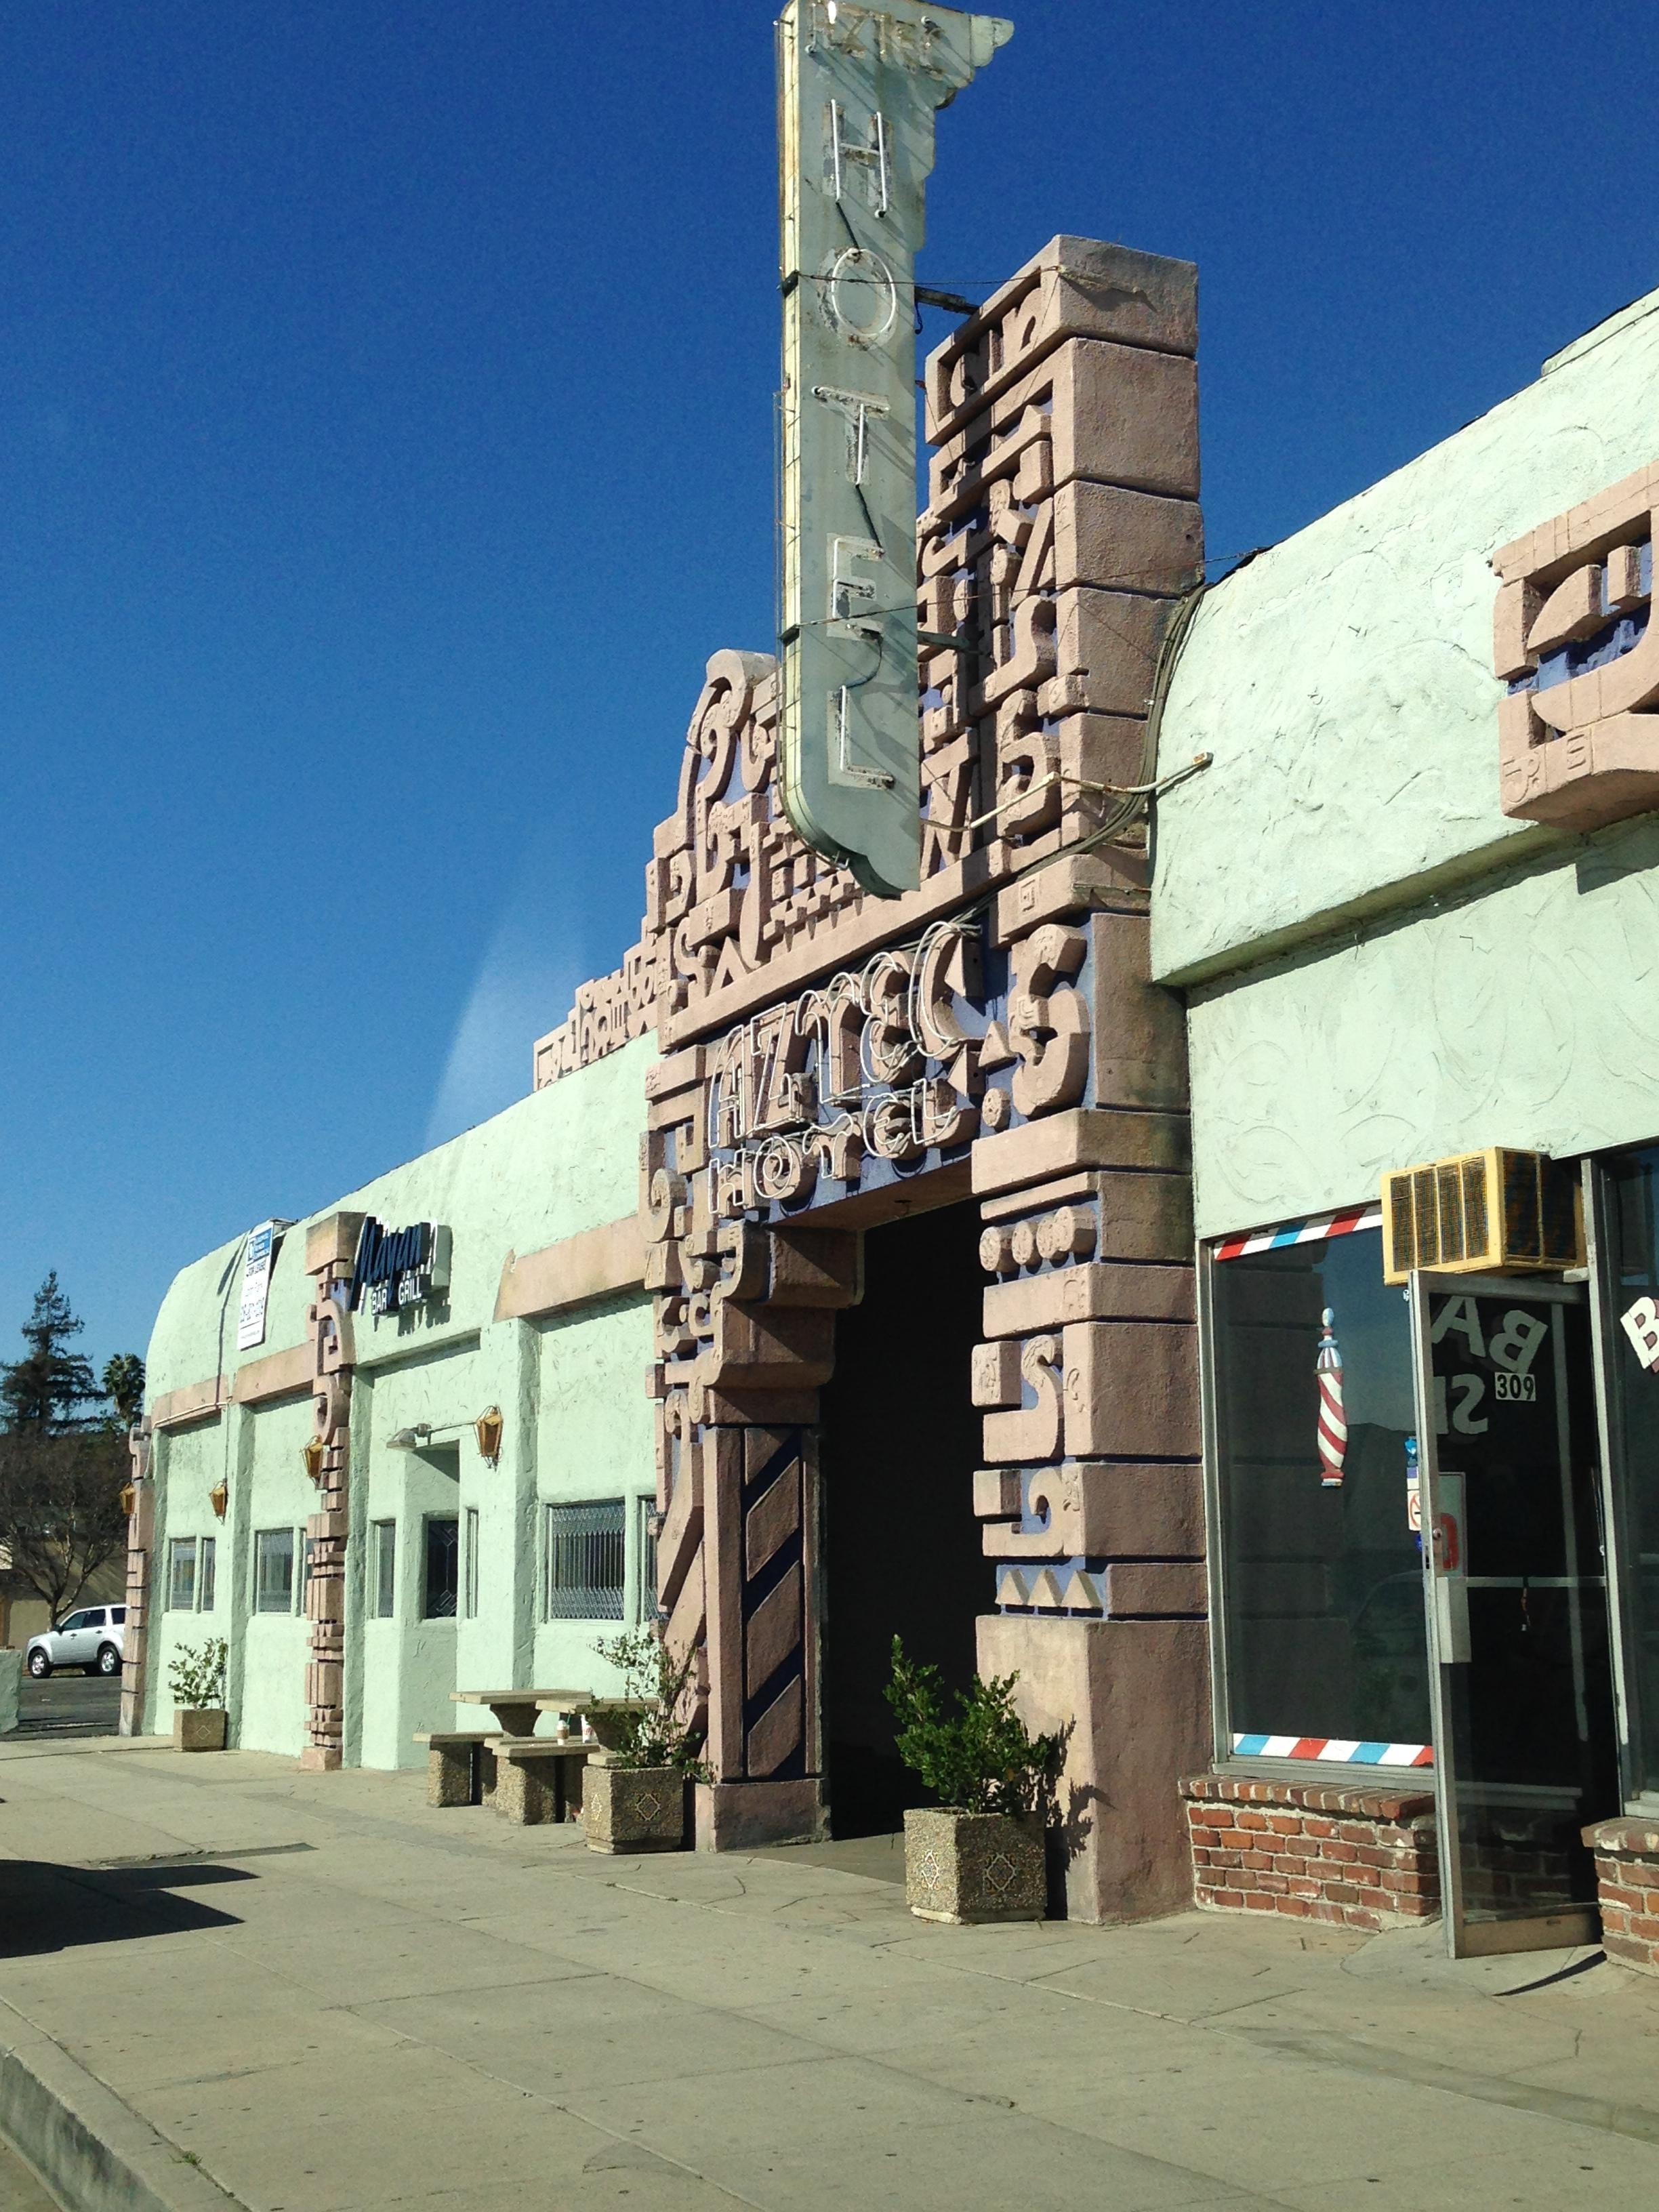 The Aztec Hotel Monrovia S Route 66 Relic Last One On